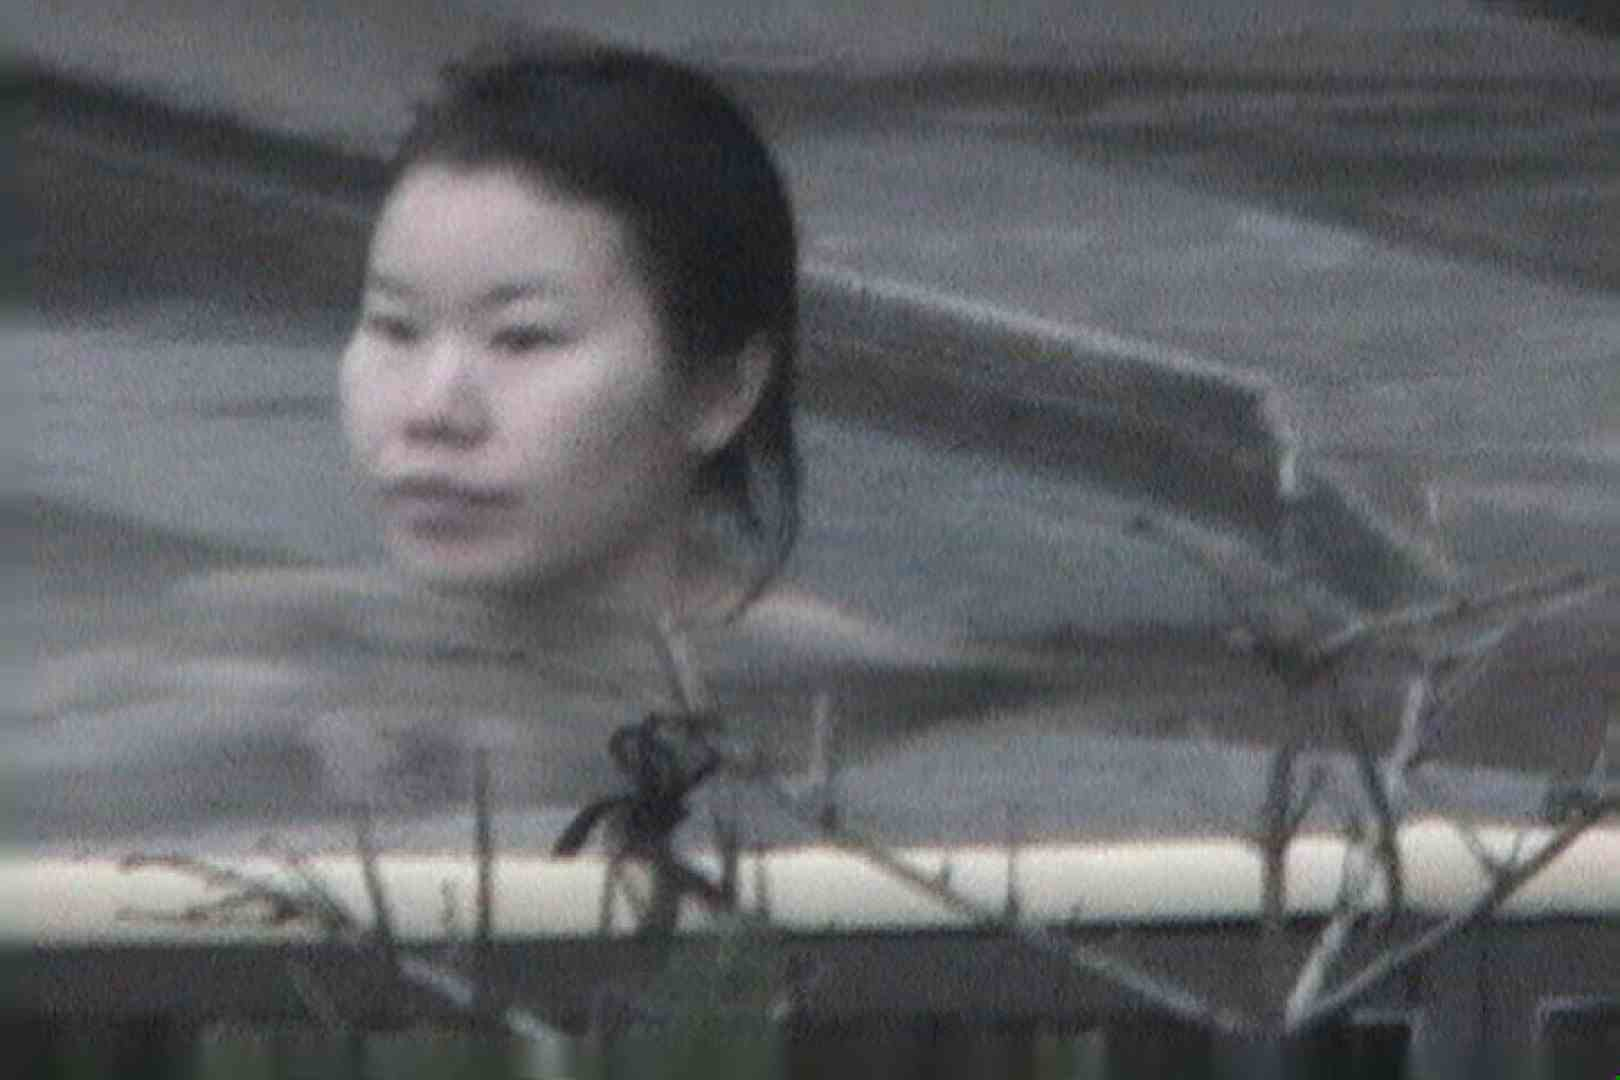 Aquaな露天風呂Vol.556 露天風呂編 | 盗撮シリーズ  99PIX 89